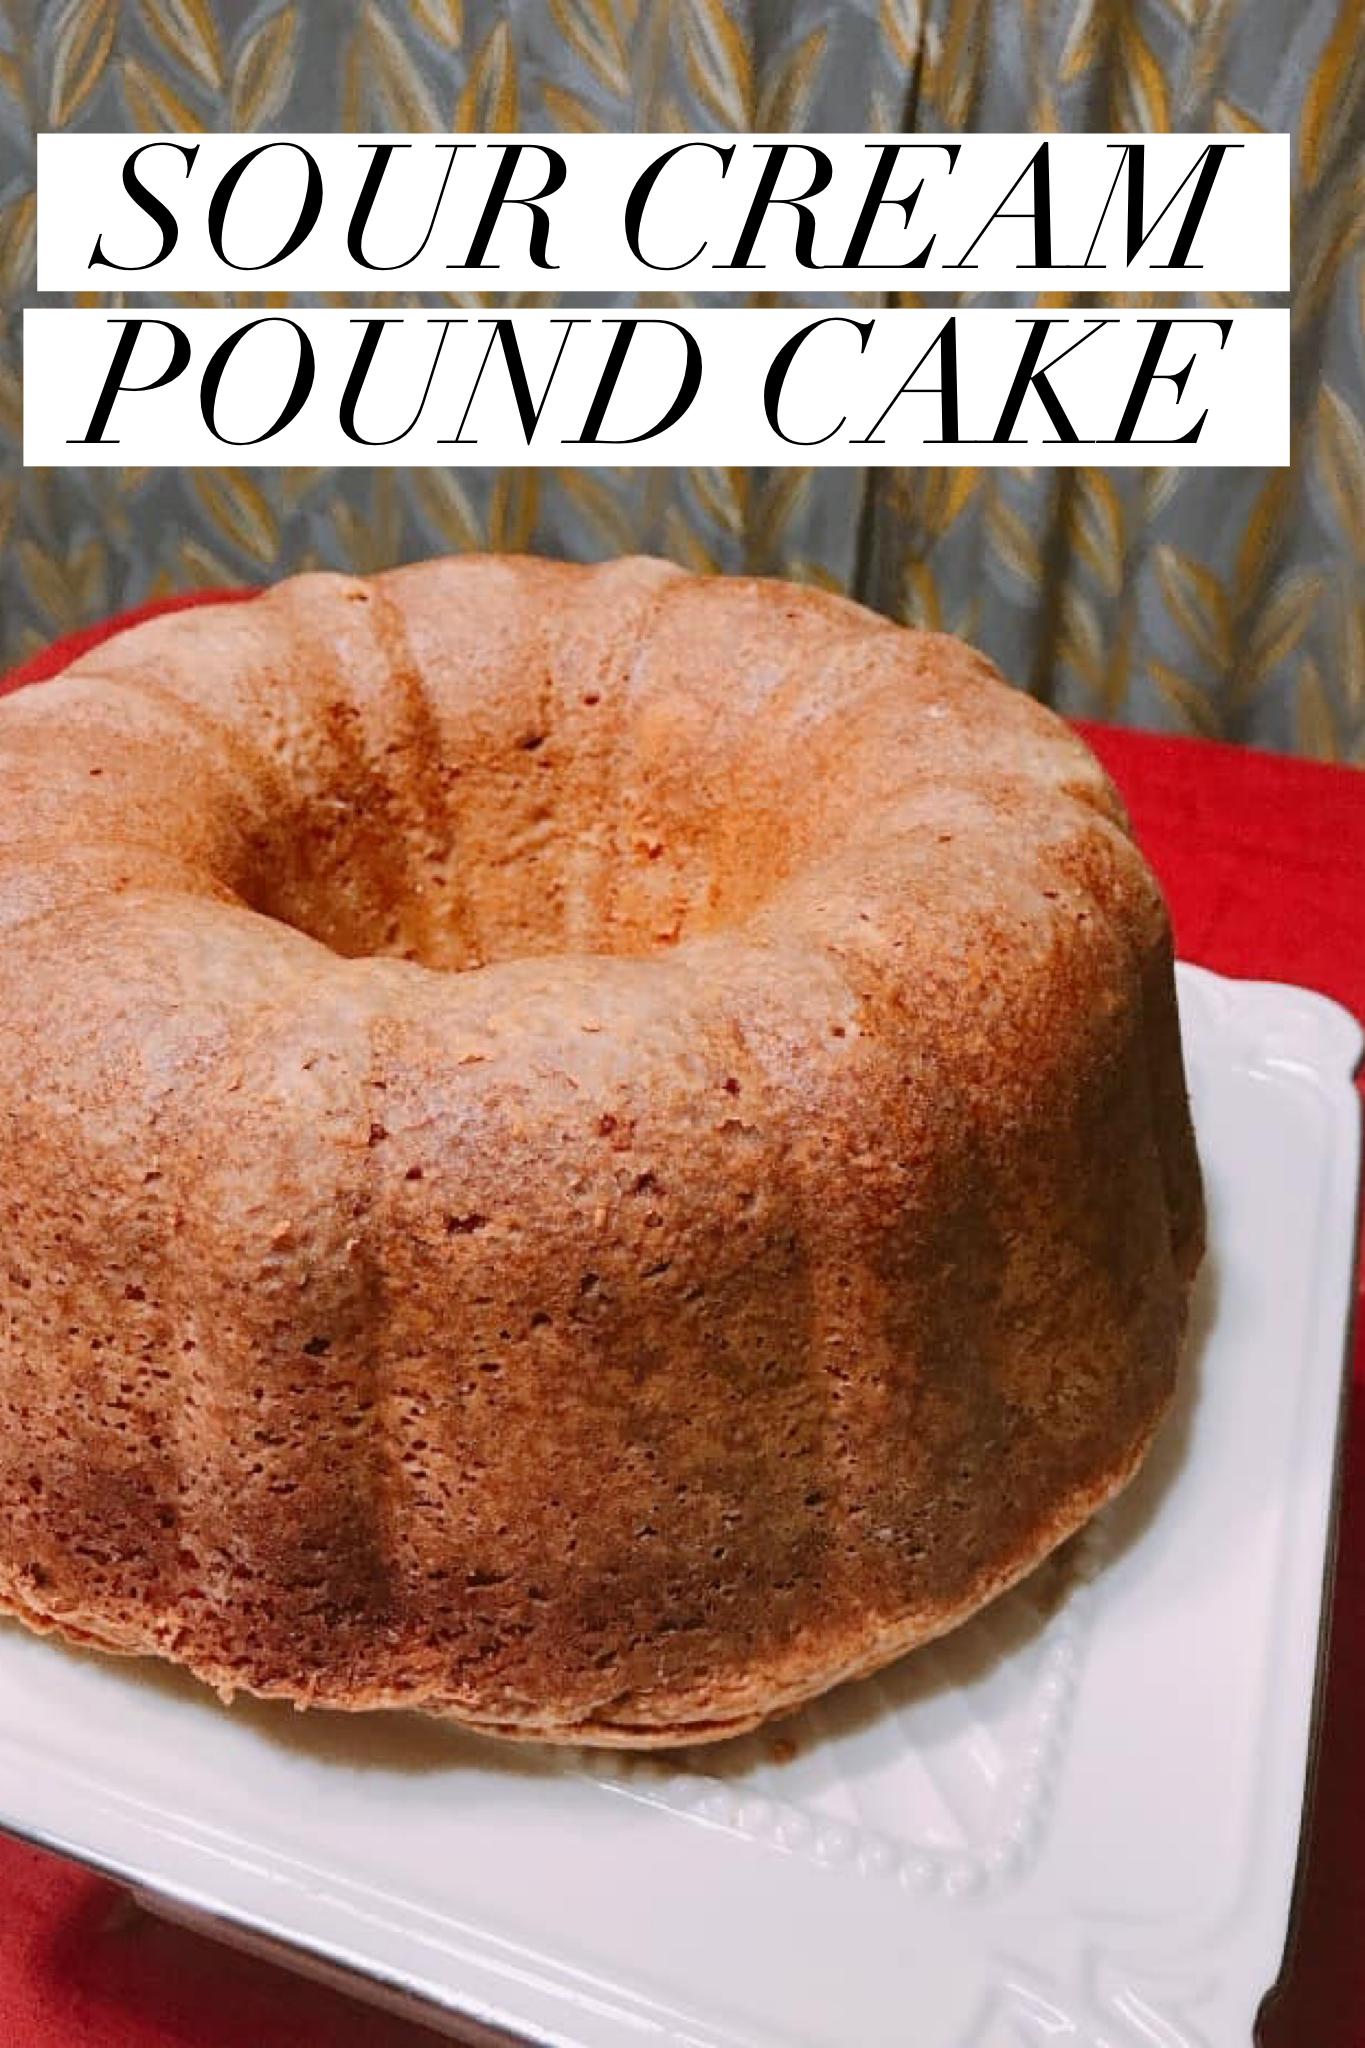 Grandma S Sour Cream Pound Cake Sour Cream Pound Cake Pound Cake Recipes Easy Classic Pound Cake Recipe